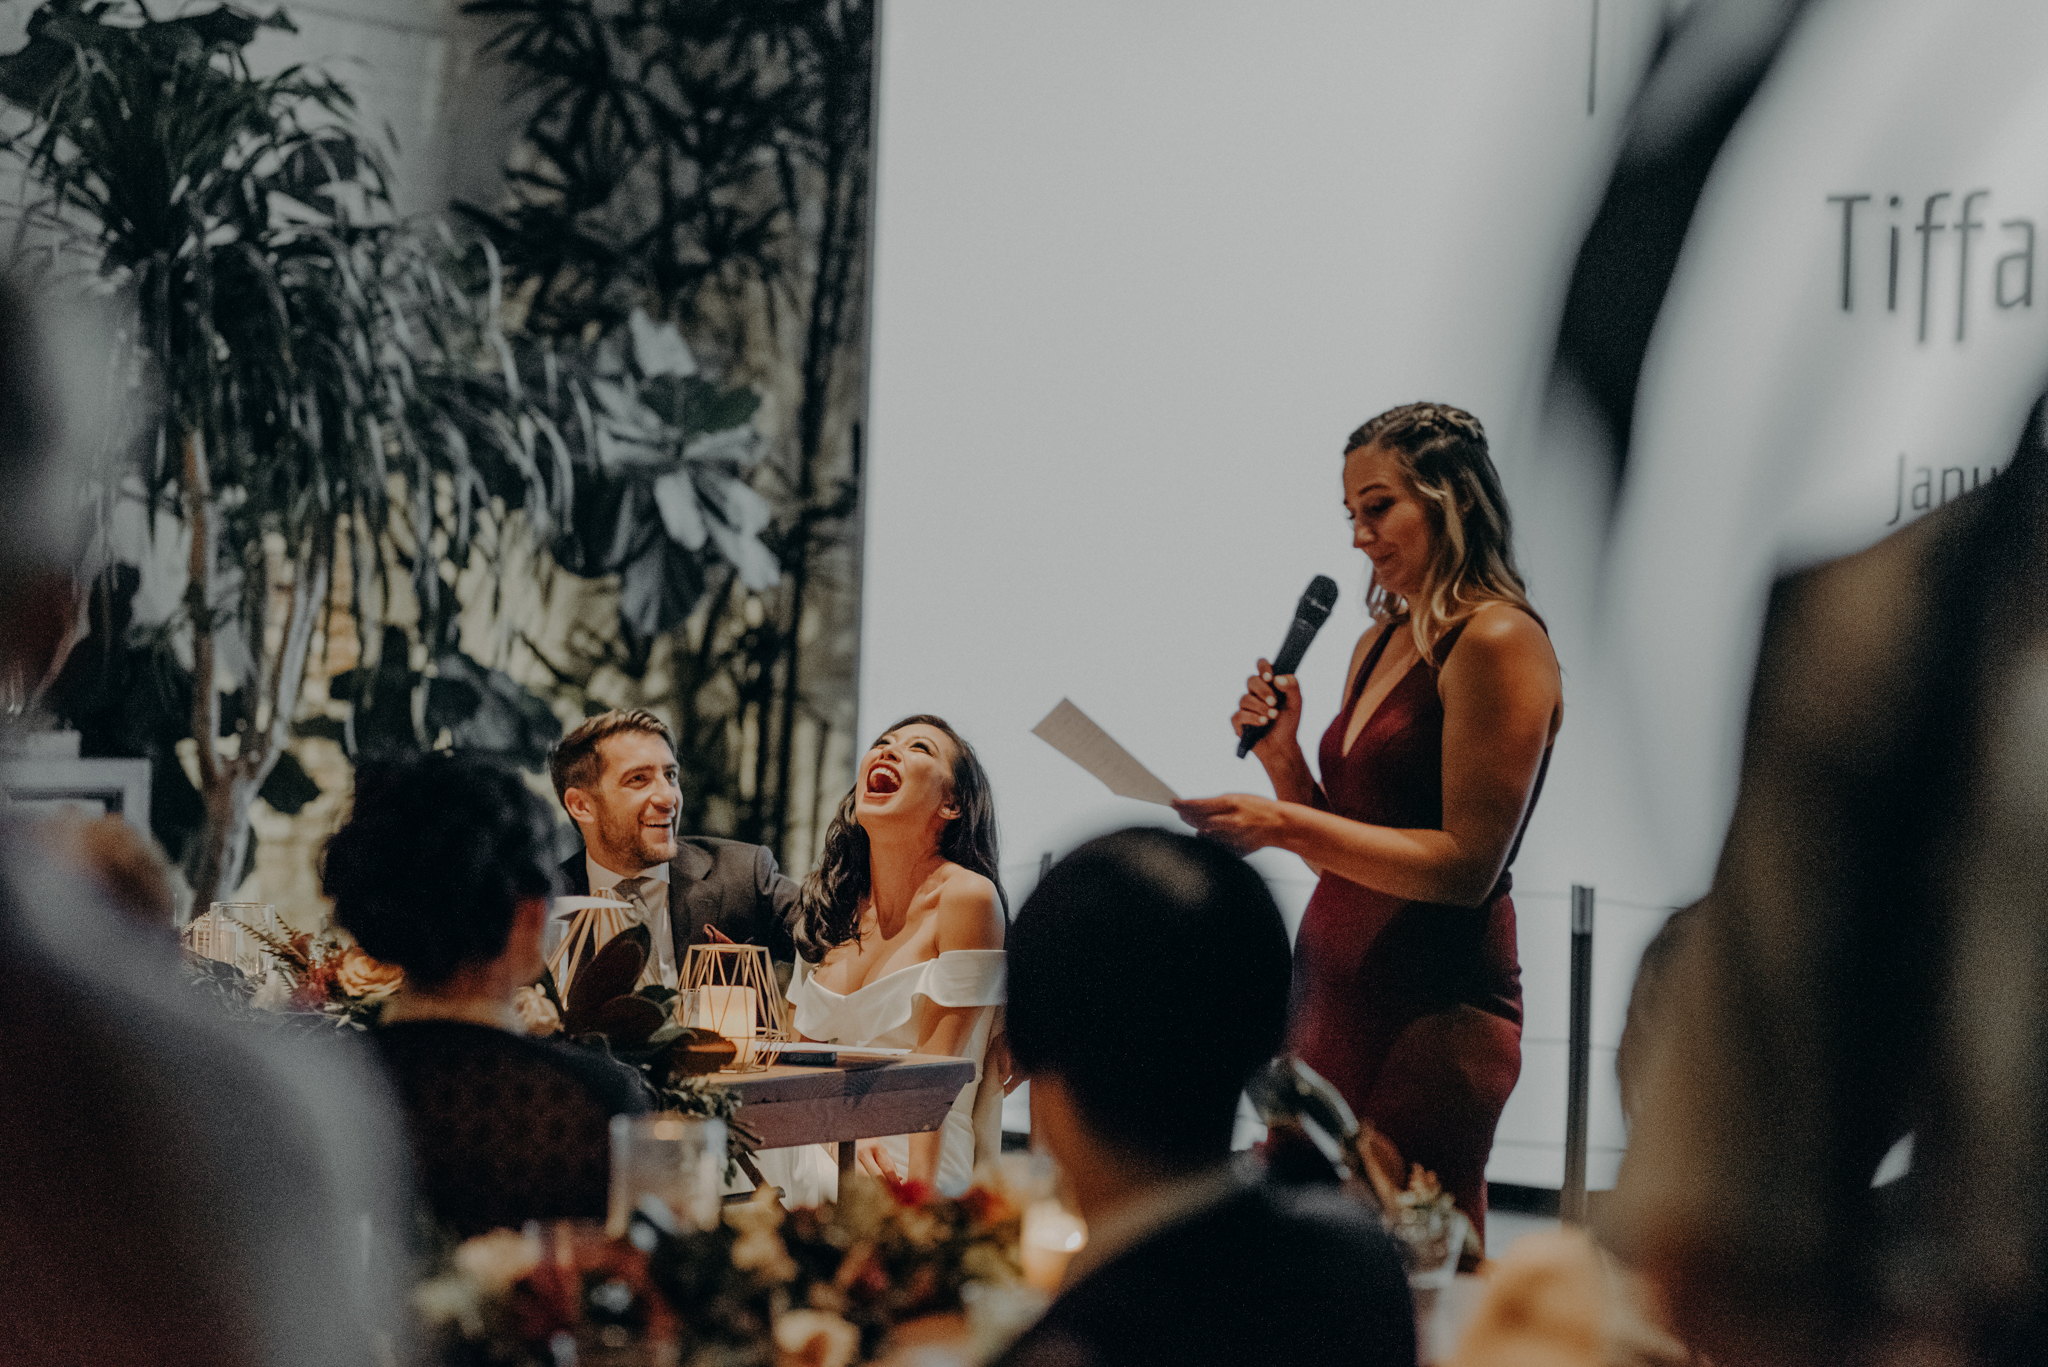 Wedding Photo LA - wedding photographer in los angeles - millwick wedding venue -isaiahandtaylor.com-127.jpg